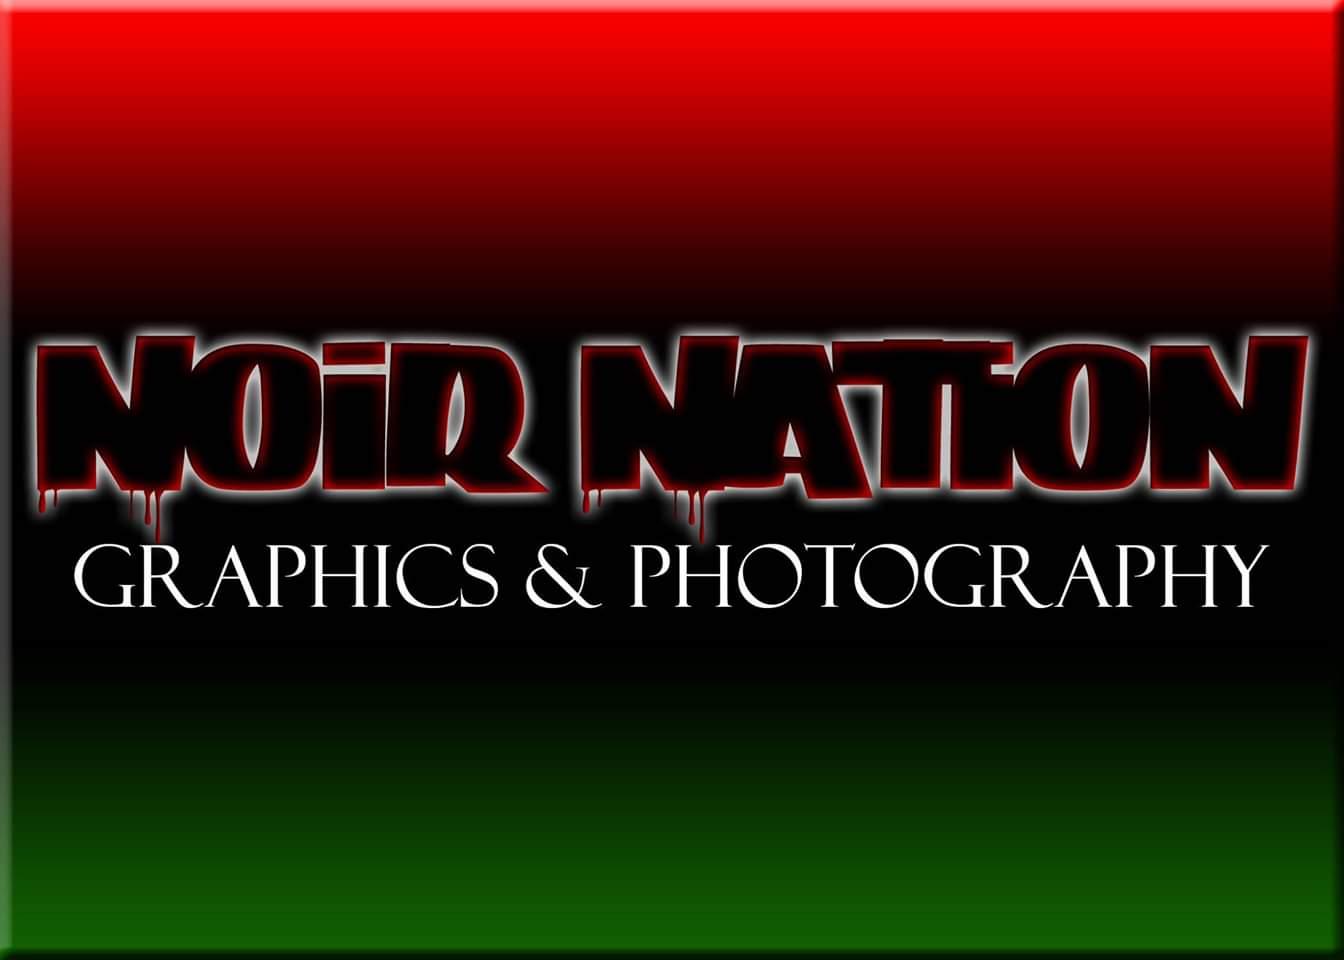 Noir Nation Graphics & Photography